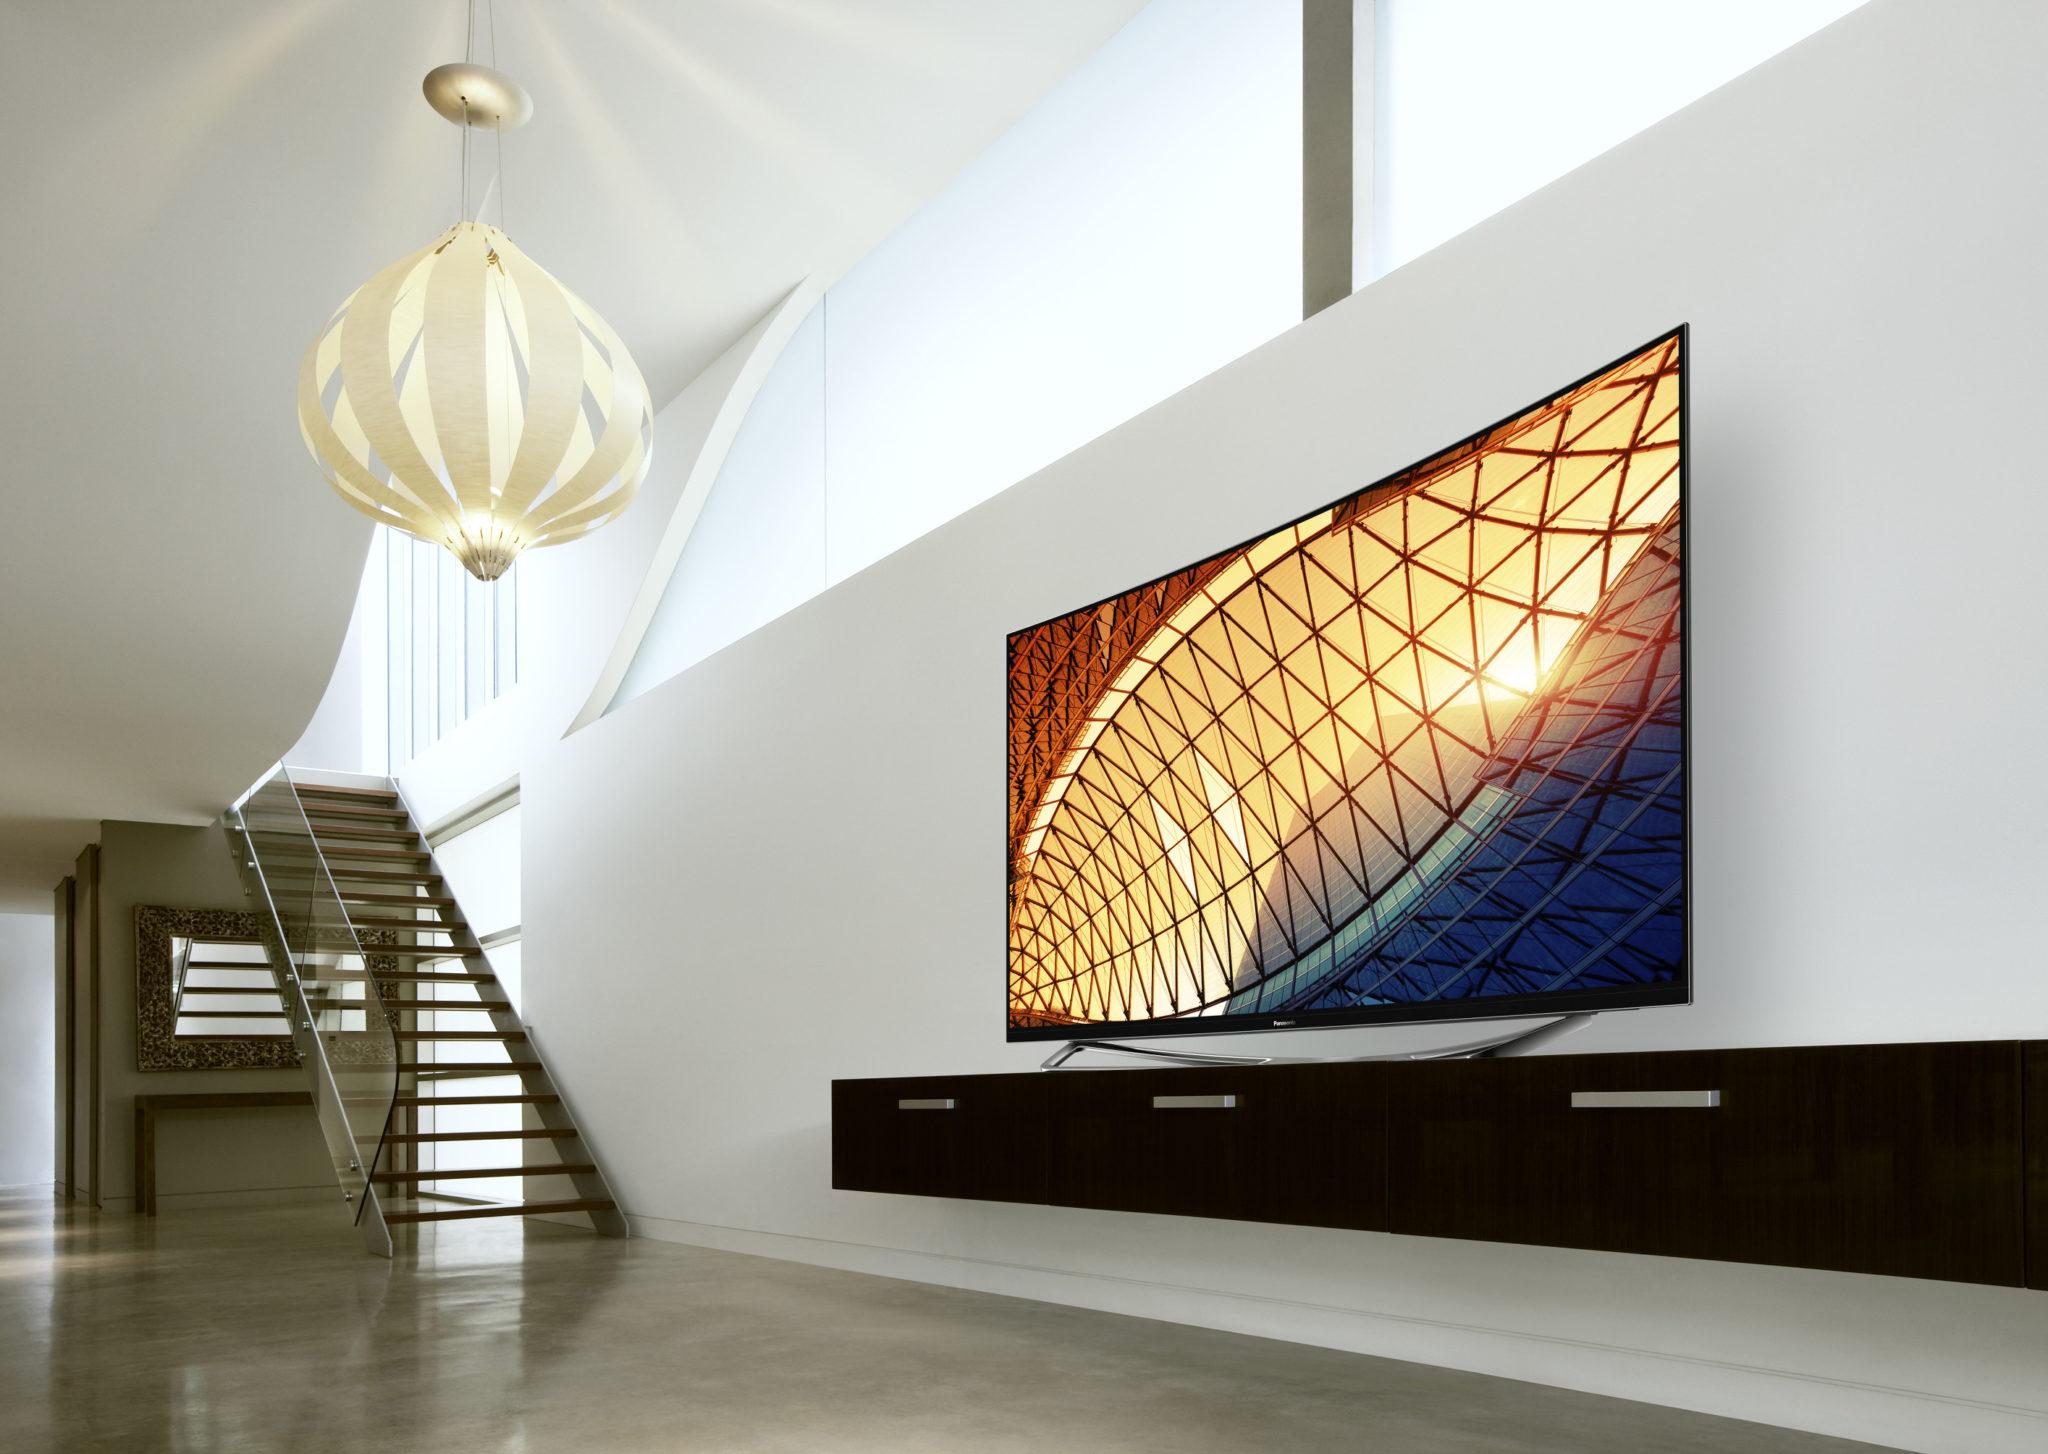 Panasonic bietet OLED-Fernseher im Curved-Desgin (Bild: Panasonic)